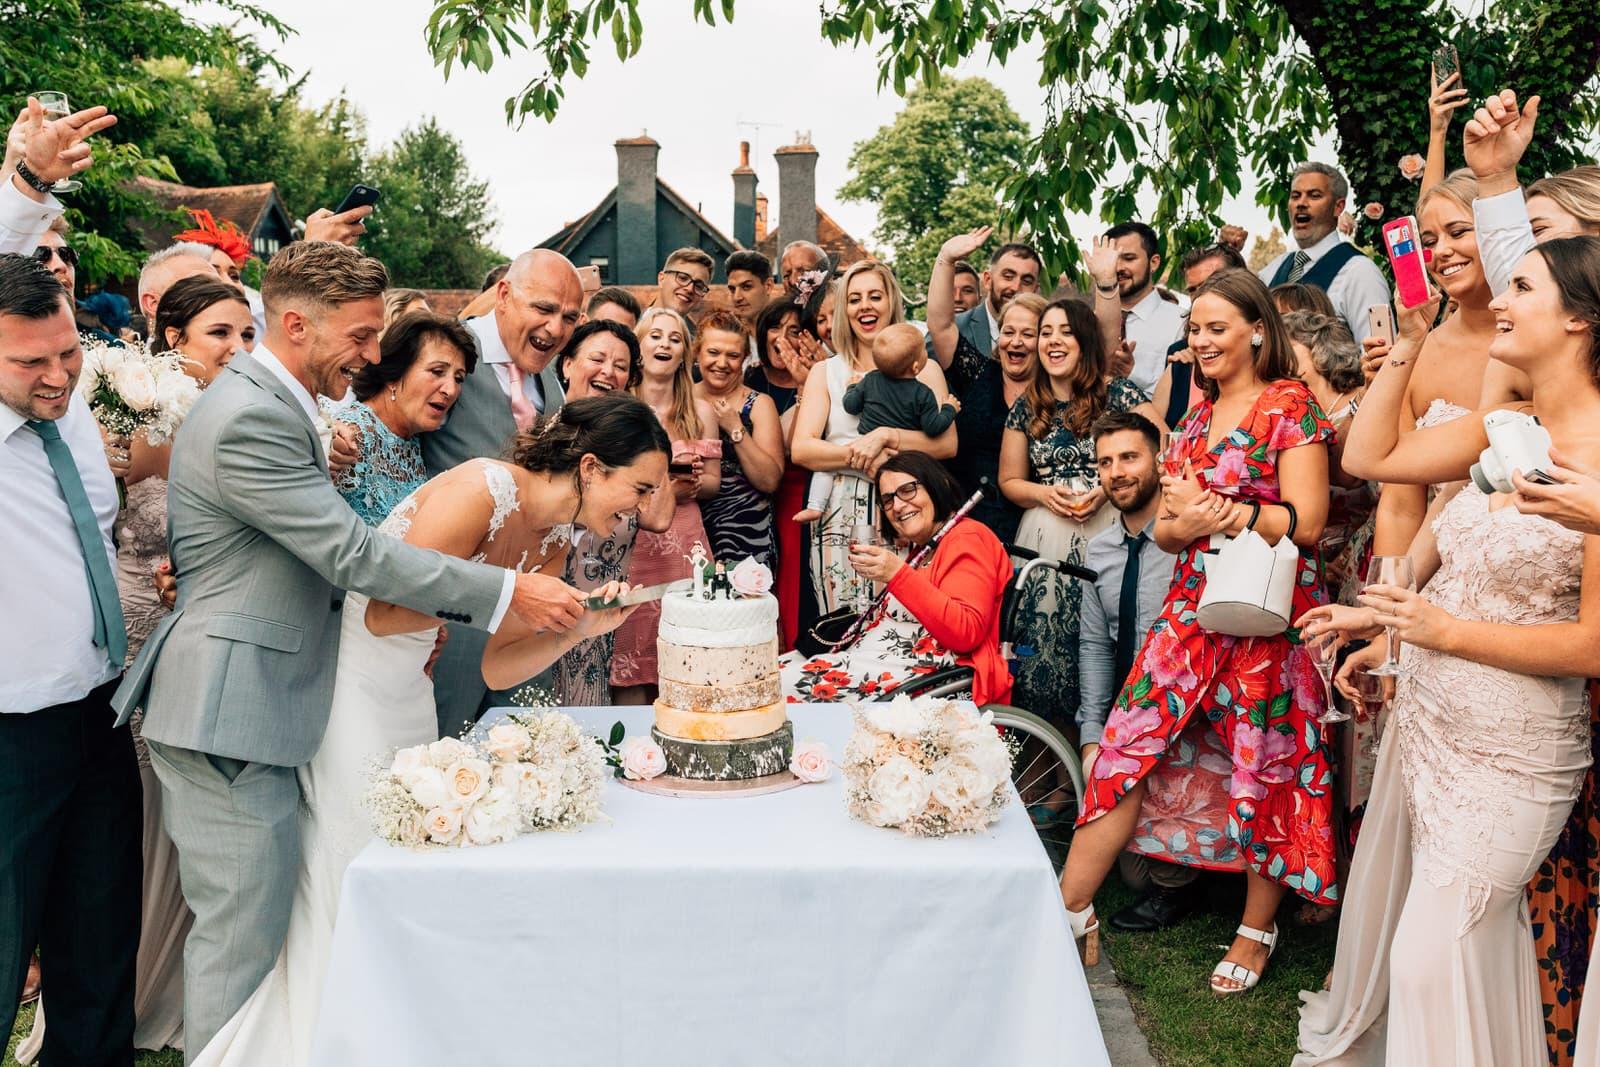 bride and groom cutting cake in garden wedding